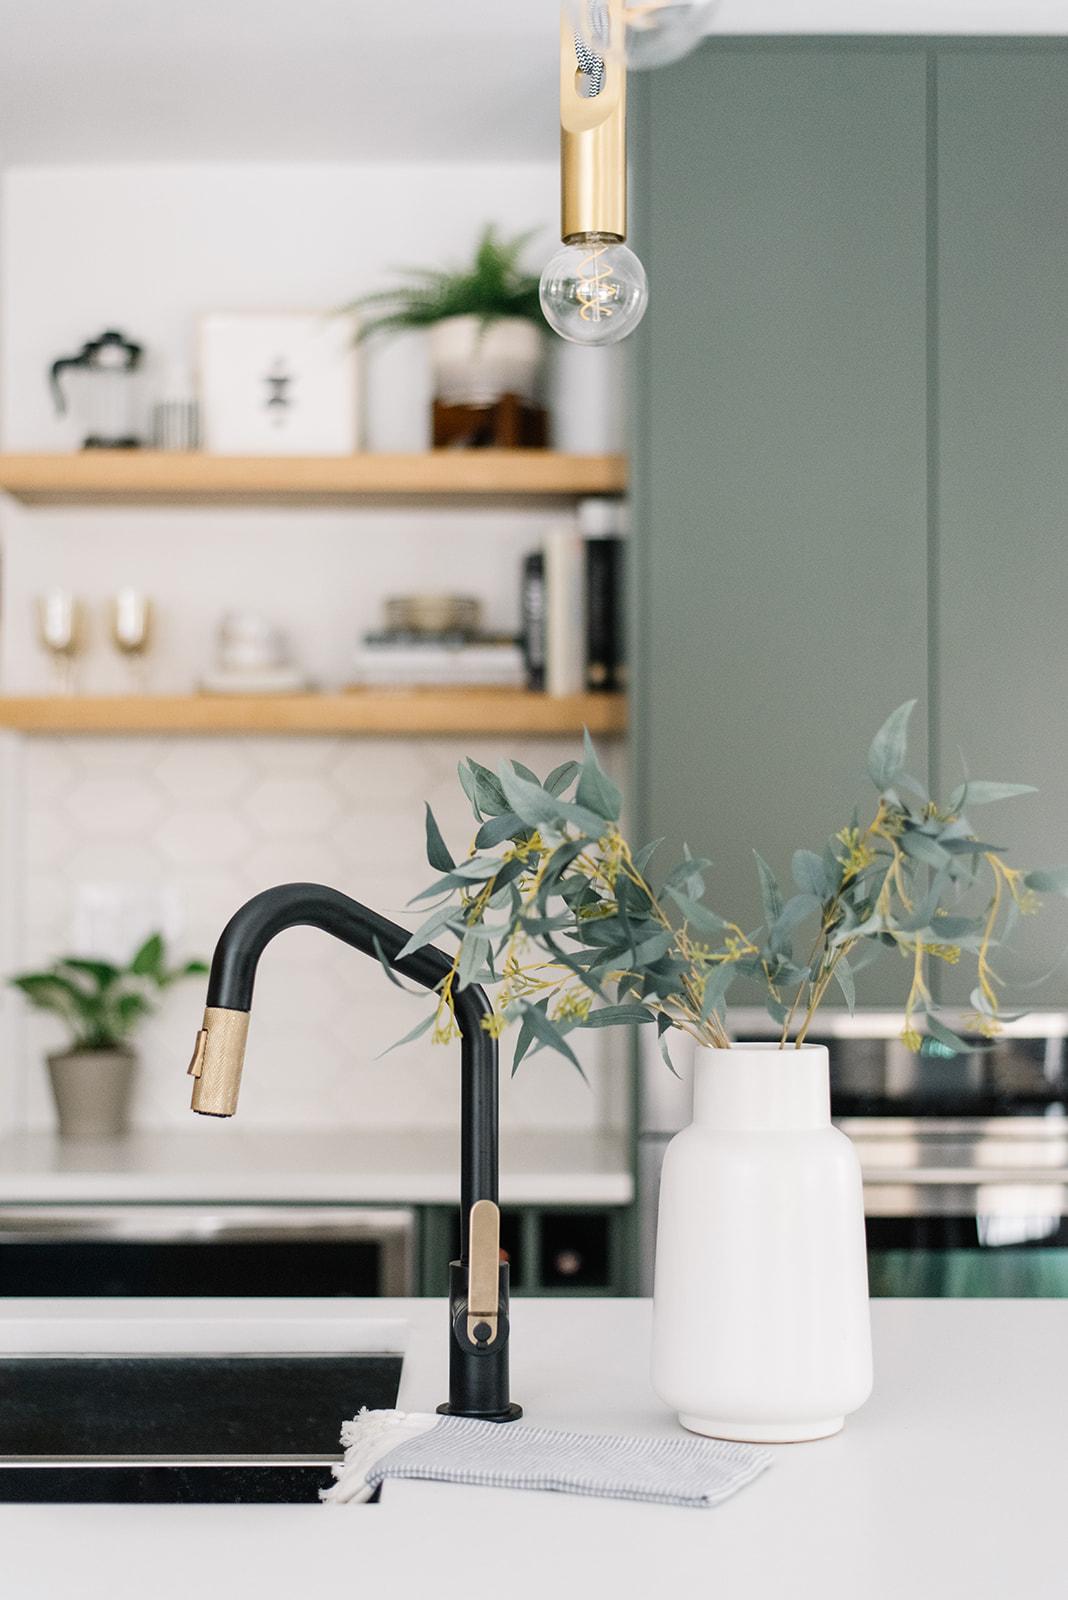 brizo litze black and brass kitchen faucet